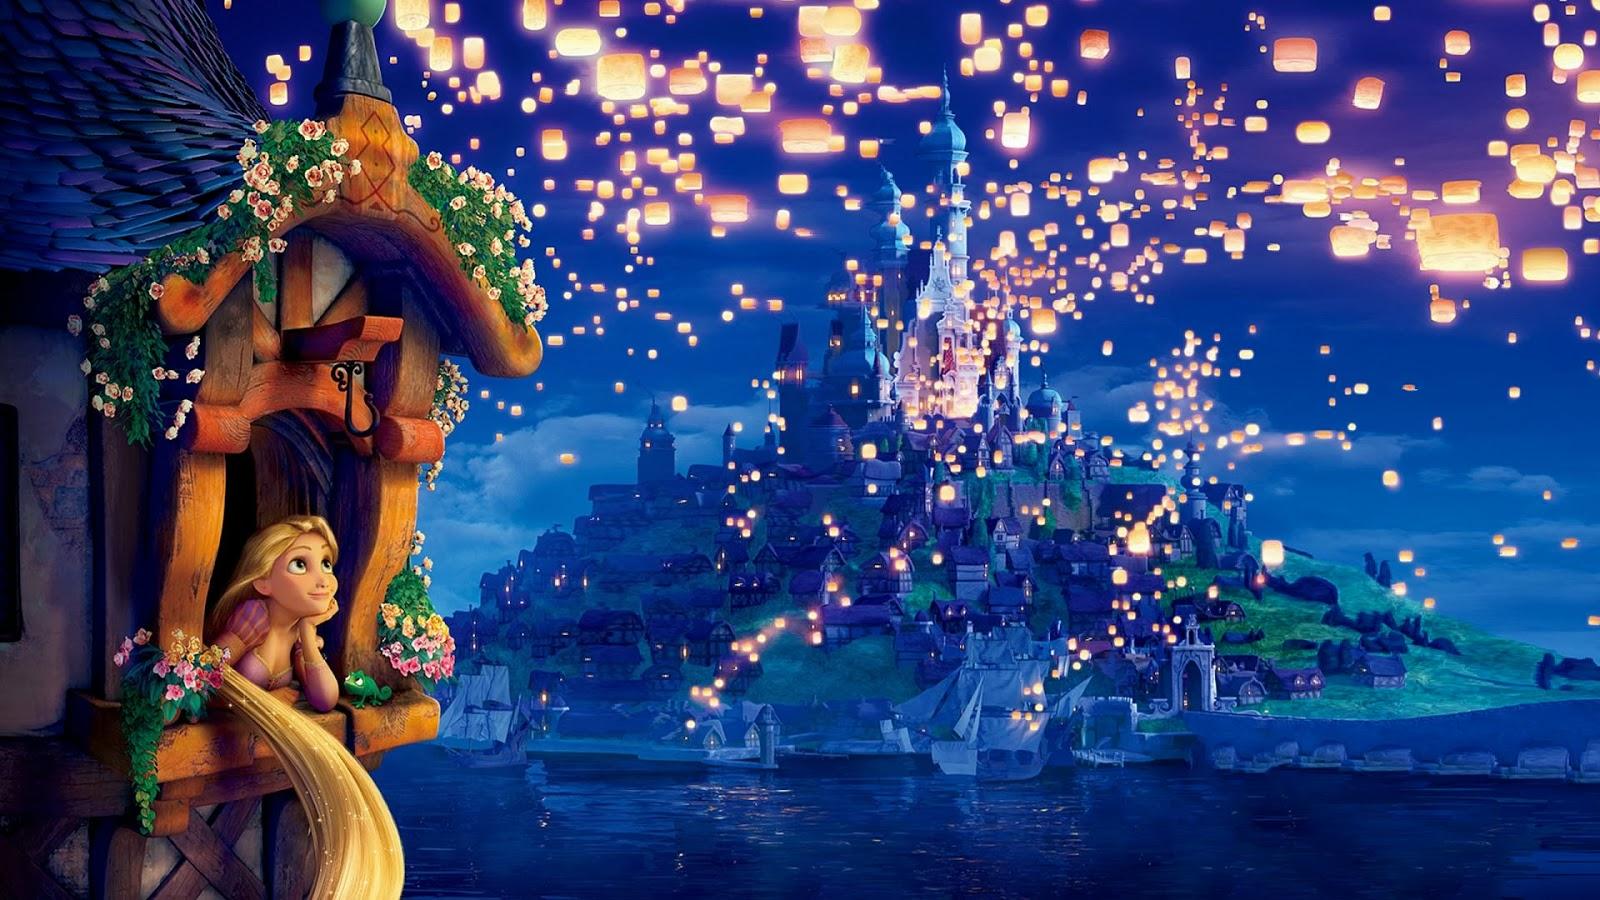 Download Disney Movies Wallpapers Free Kids Online World